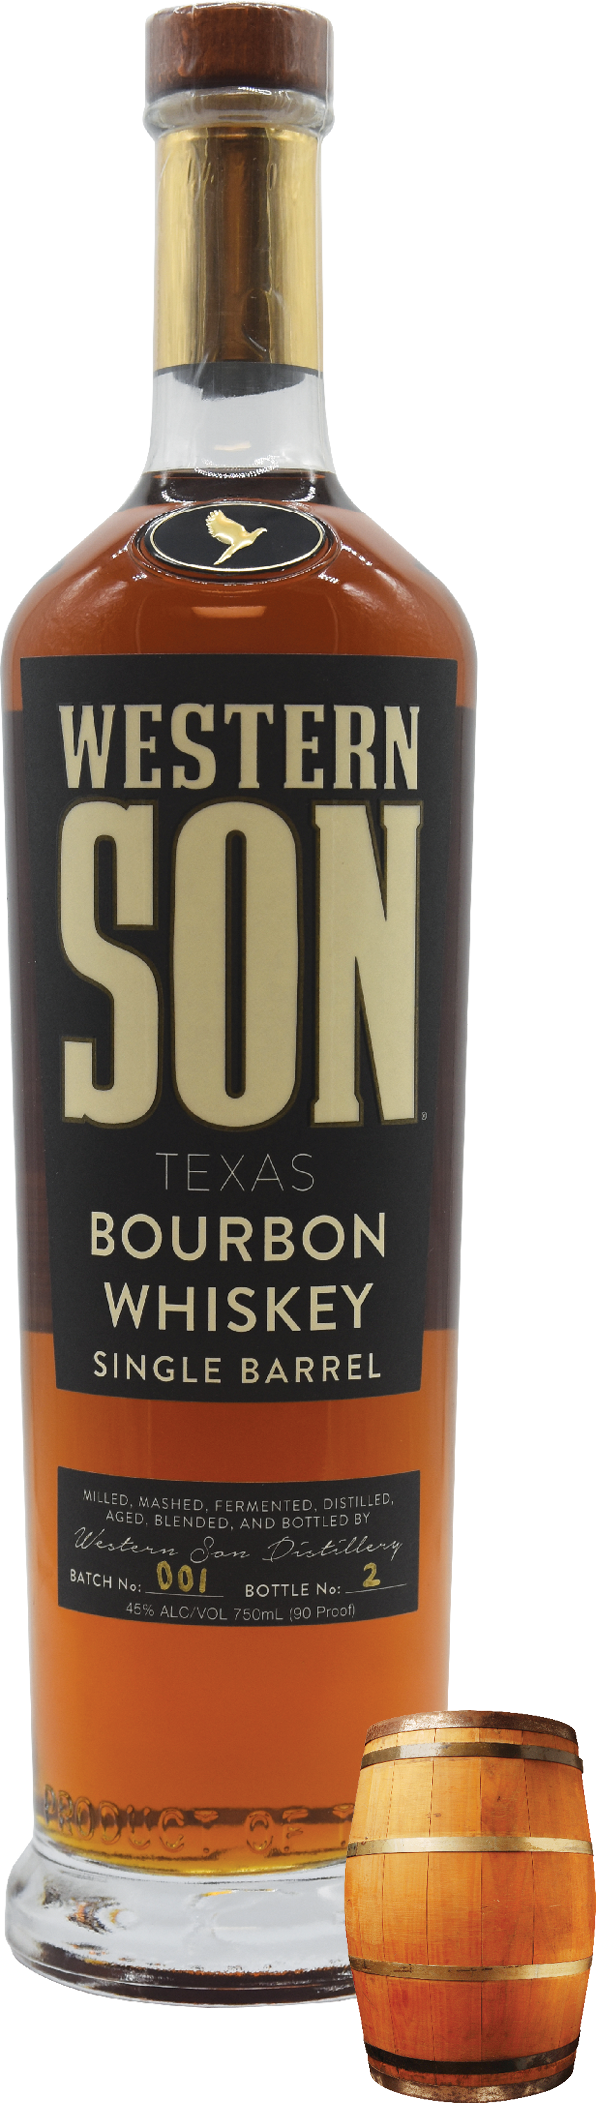 Western Son Texas Single Barrel Bourbon Whiskey